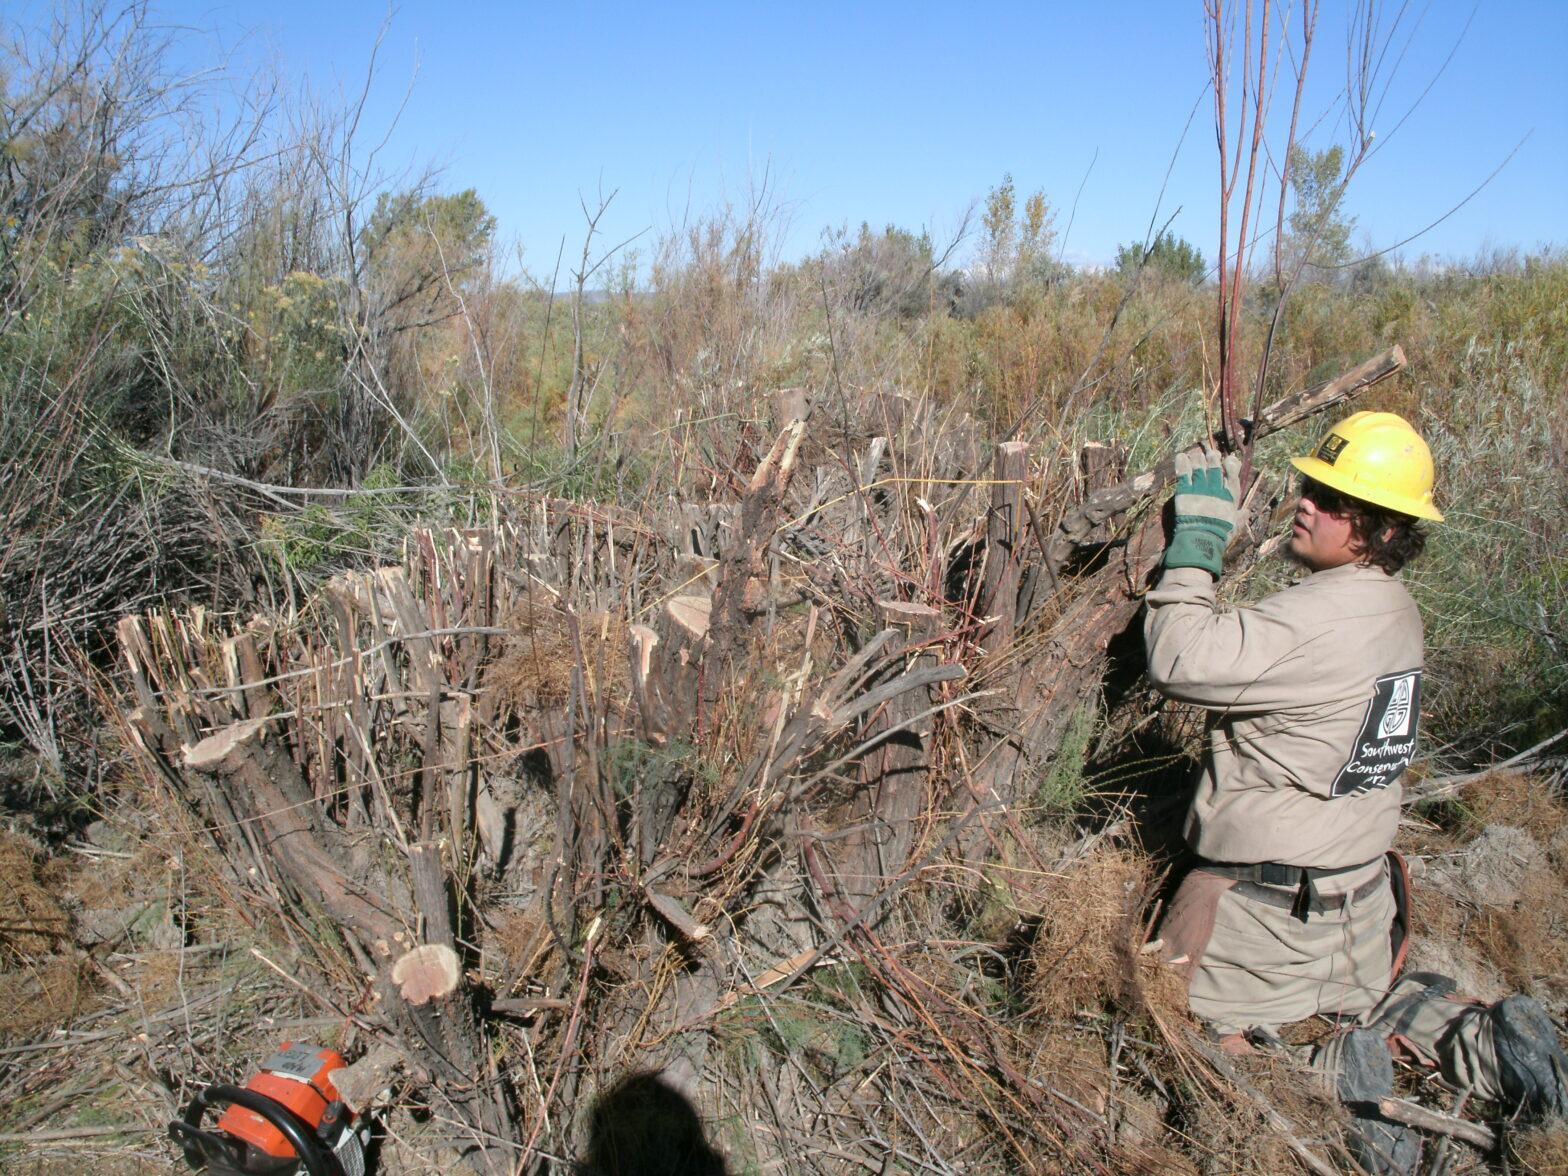 Dolores River Restoration Partnership (DRRP)